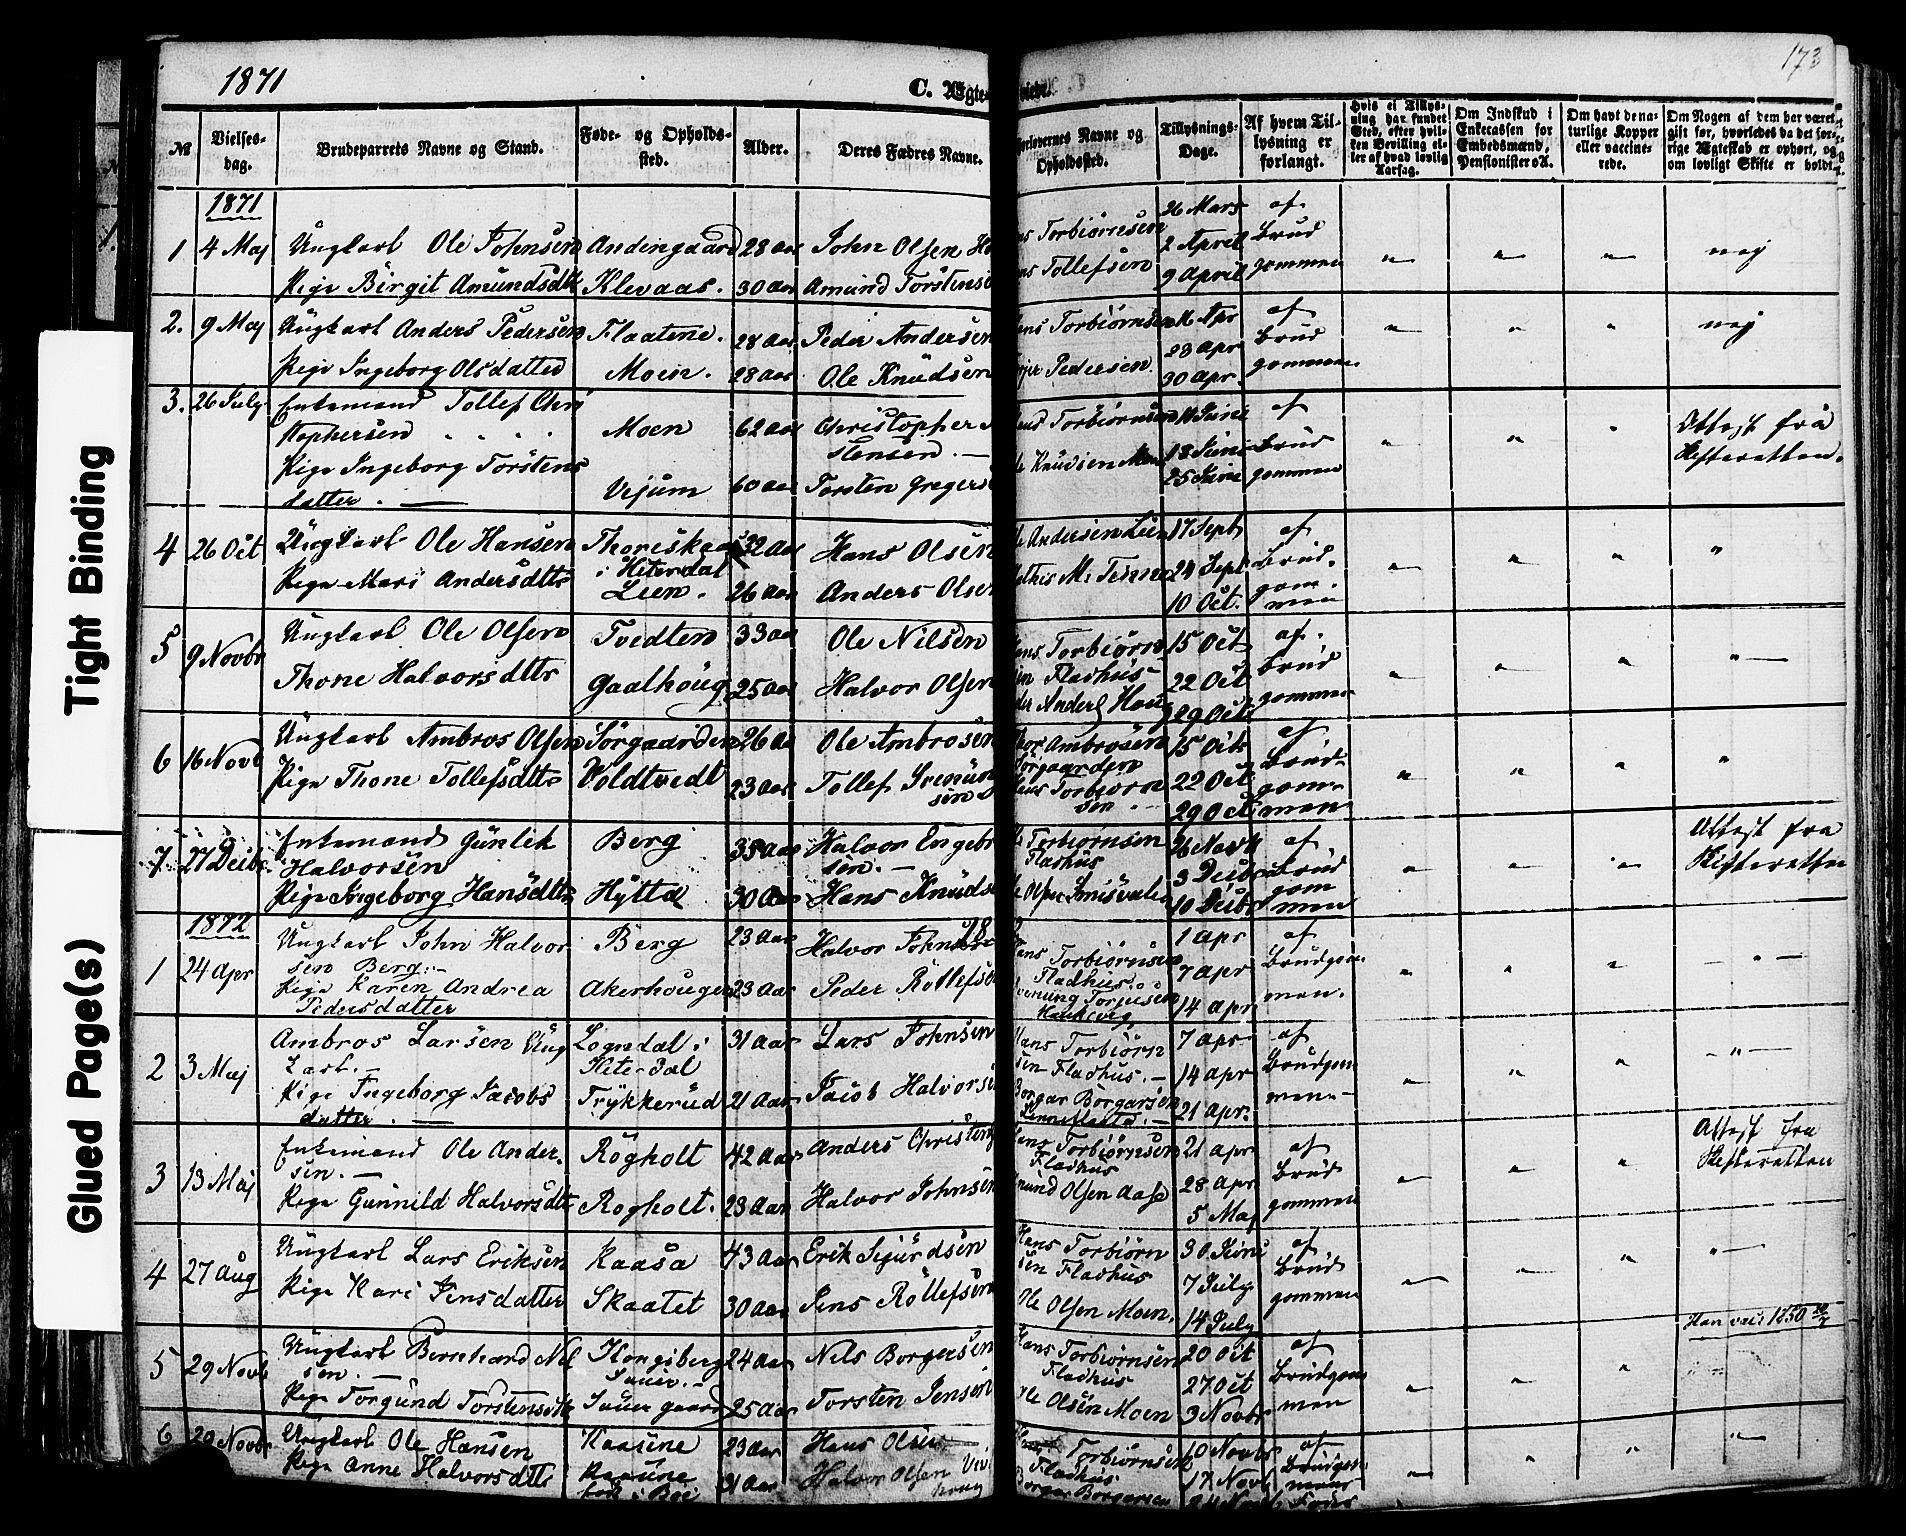 SAKO, Sauherad kirkebøker, F/Fa/L0007: Ministerialbok nr. I 7, 1851-1873, s. 173